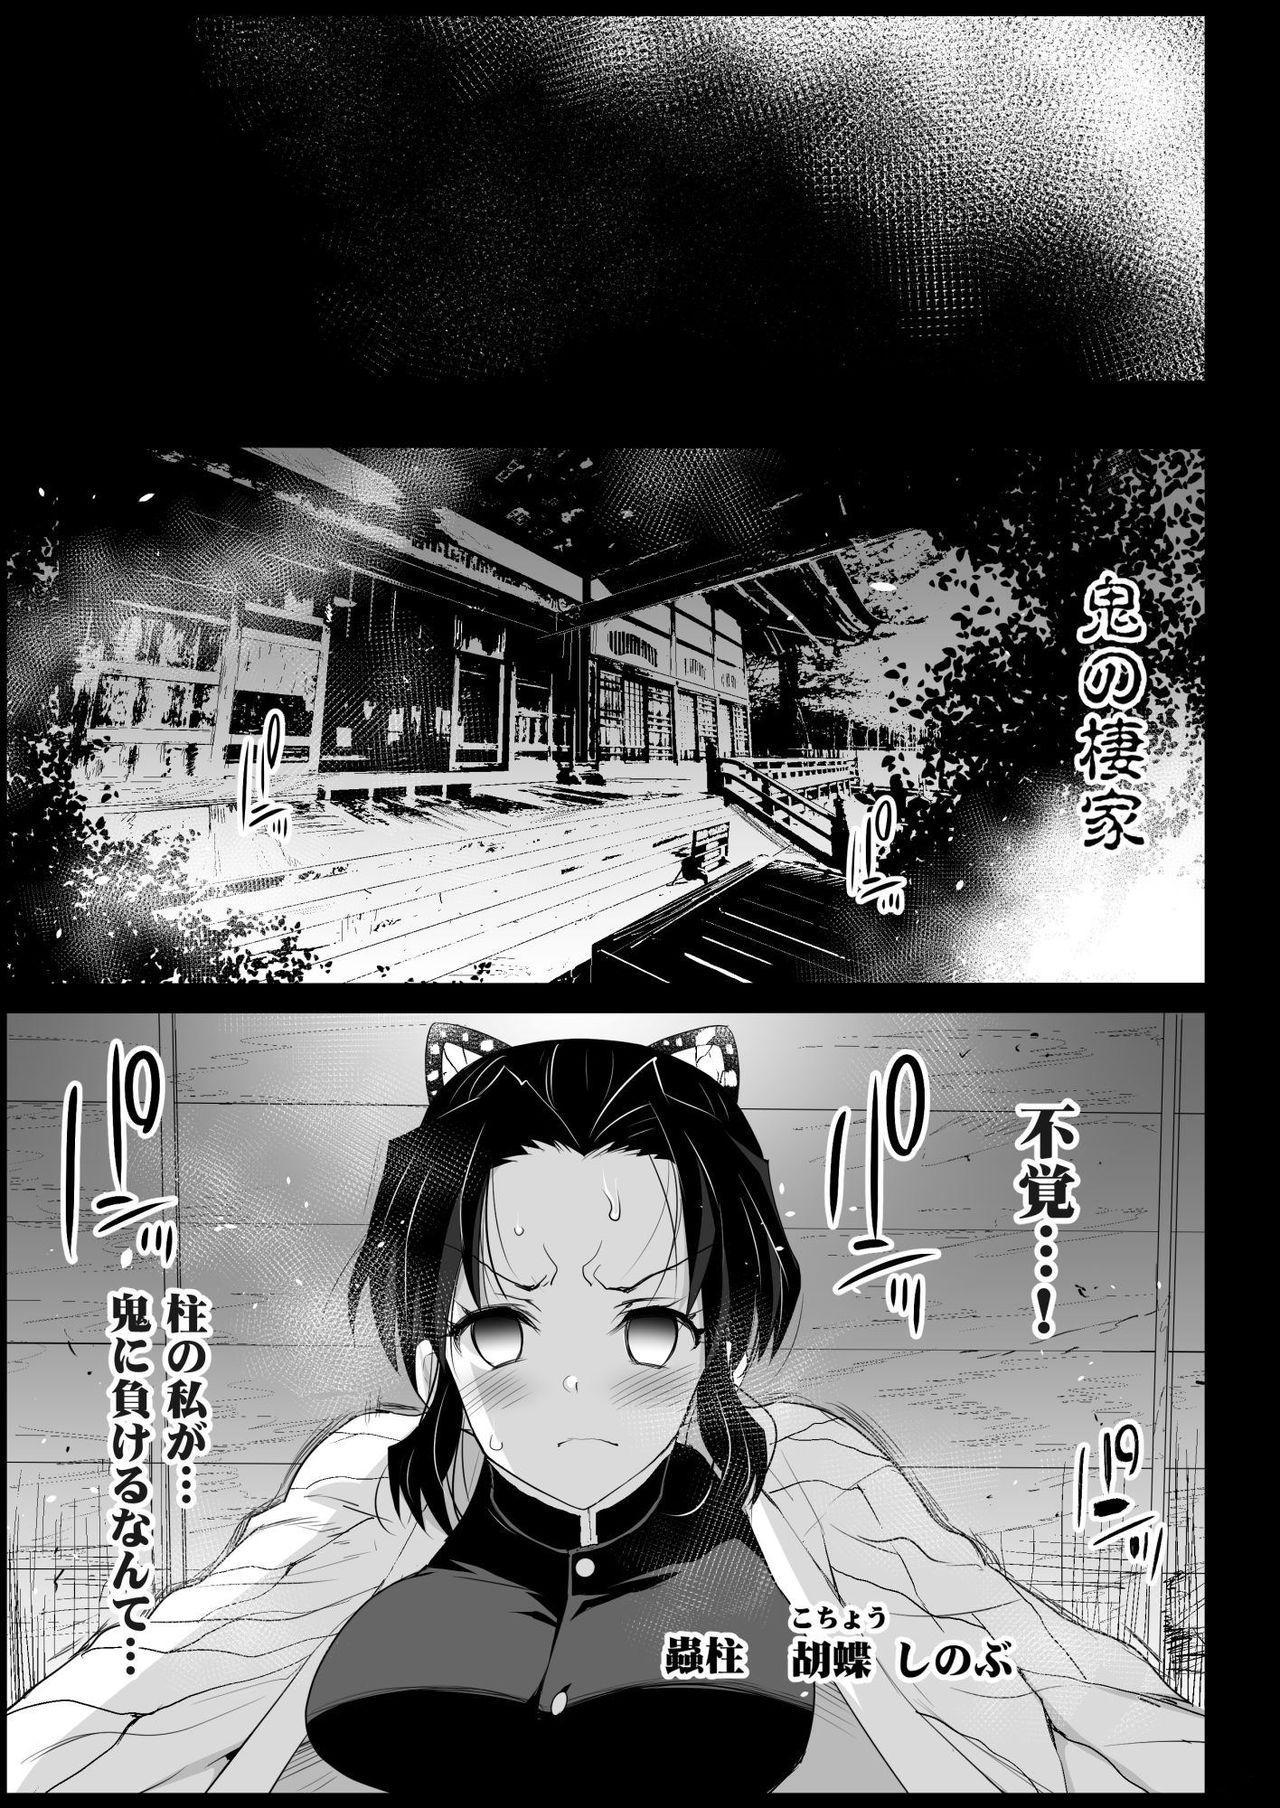 Kimetsu no Urabon - RAPE OF DEMON SLAYER 10